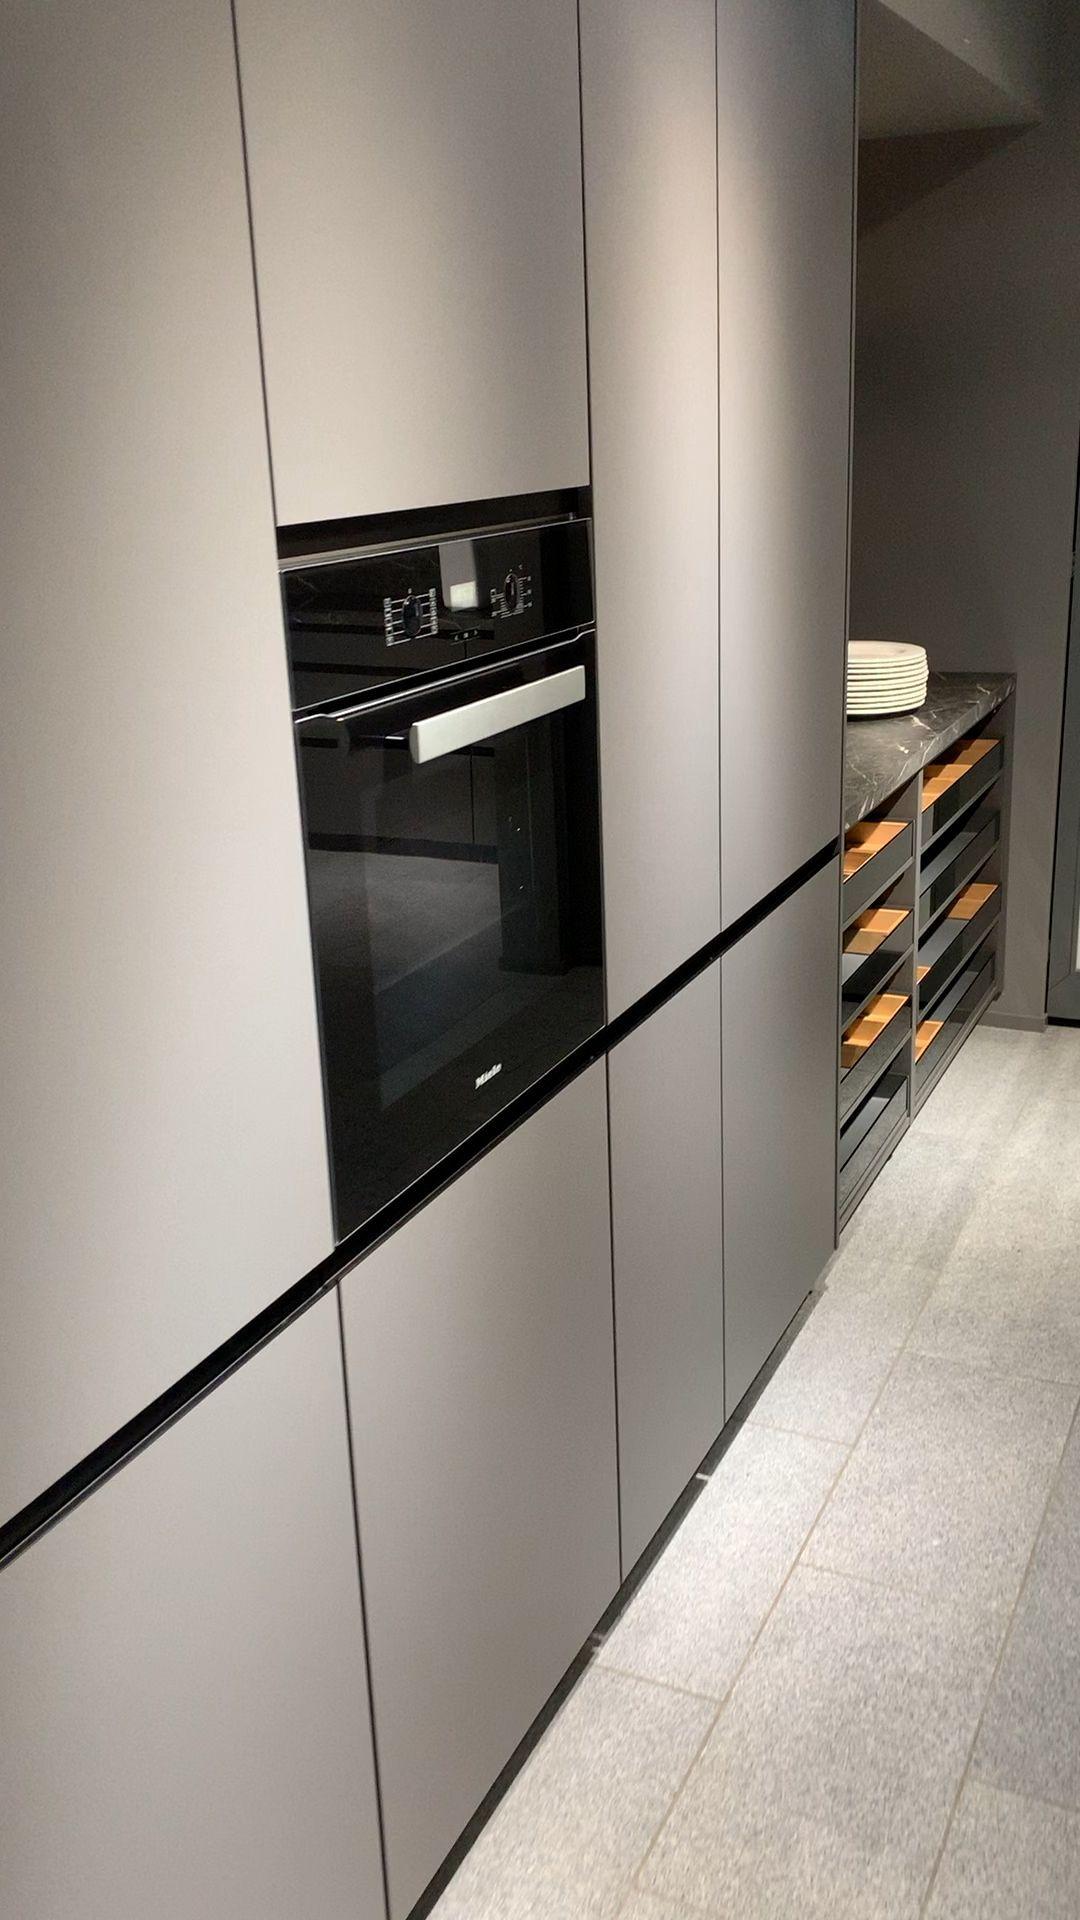 Your Kitchen Partner Keukenontwerptekening Kitchen Partner In 2020 Kitchen Decor Grey Kitchen Design Decor Kitchen Furniture Design